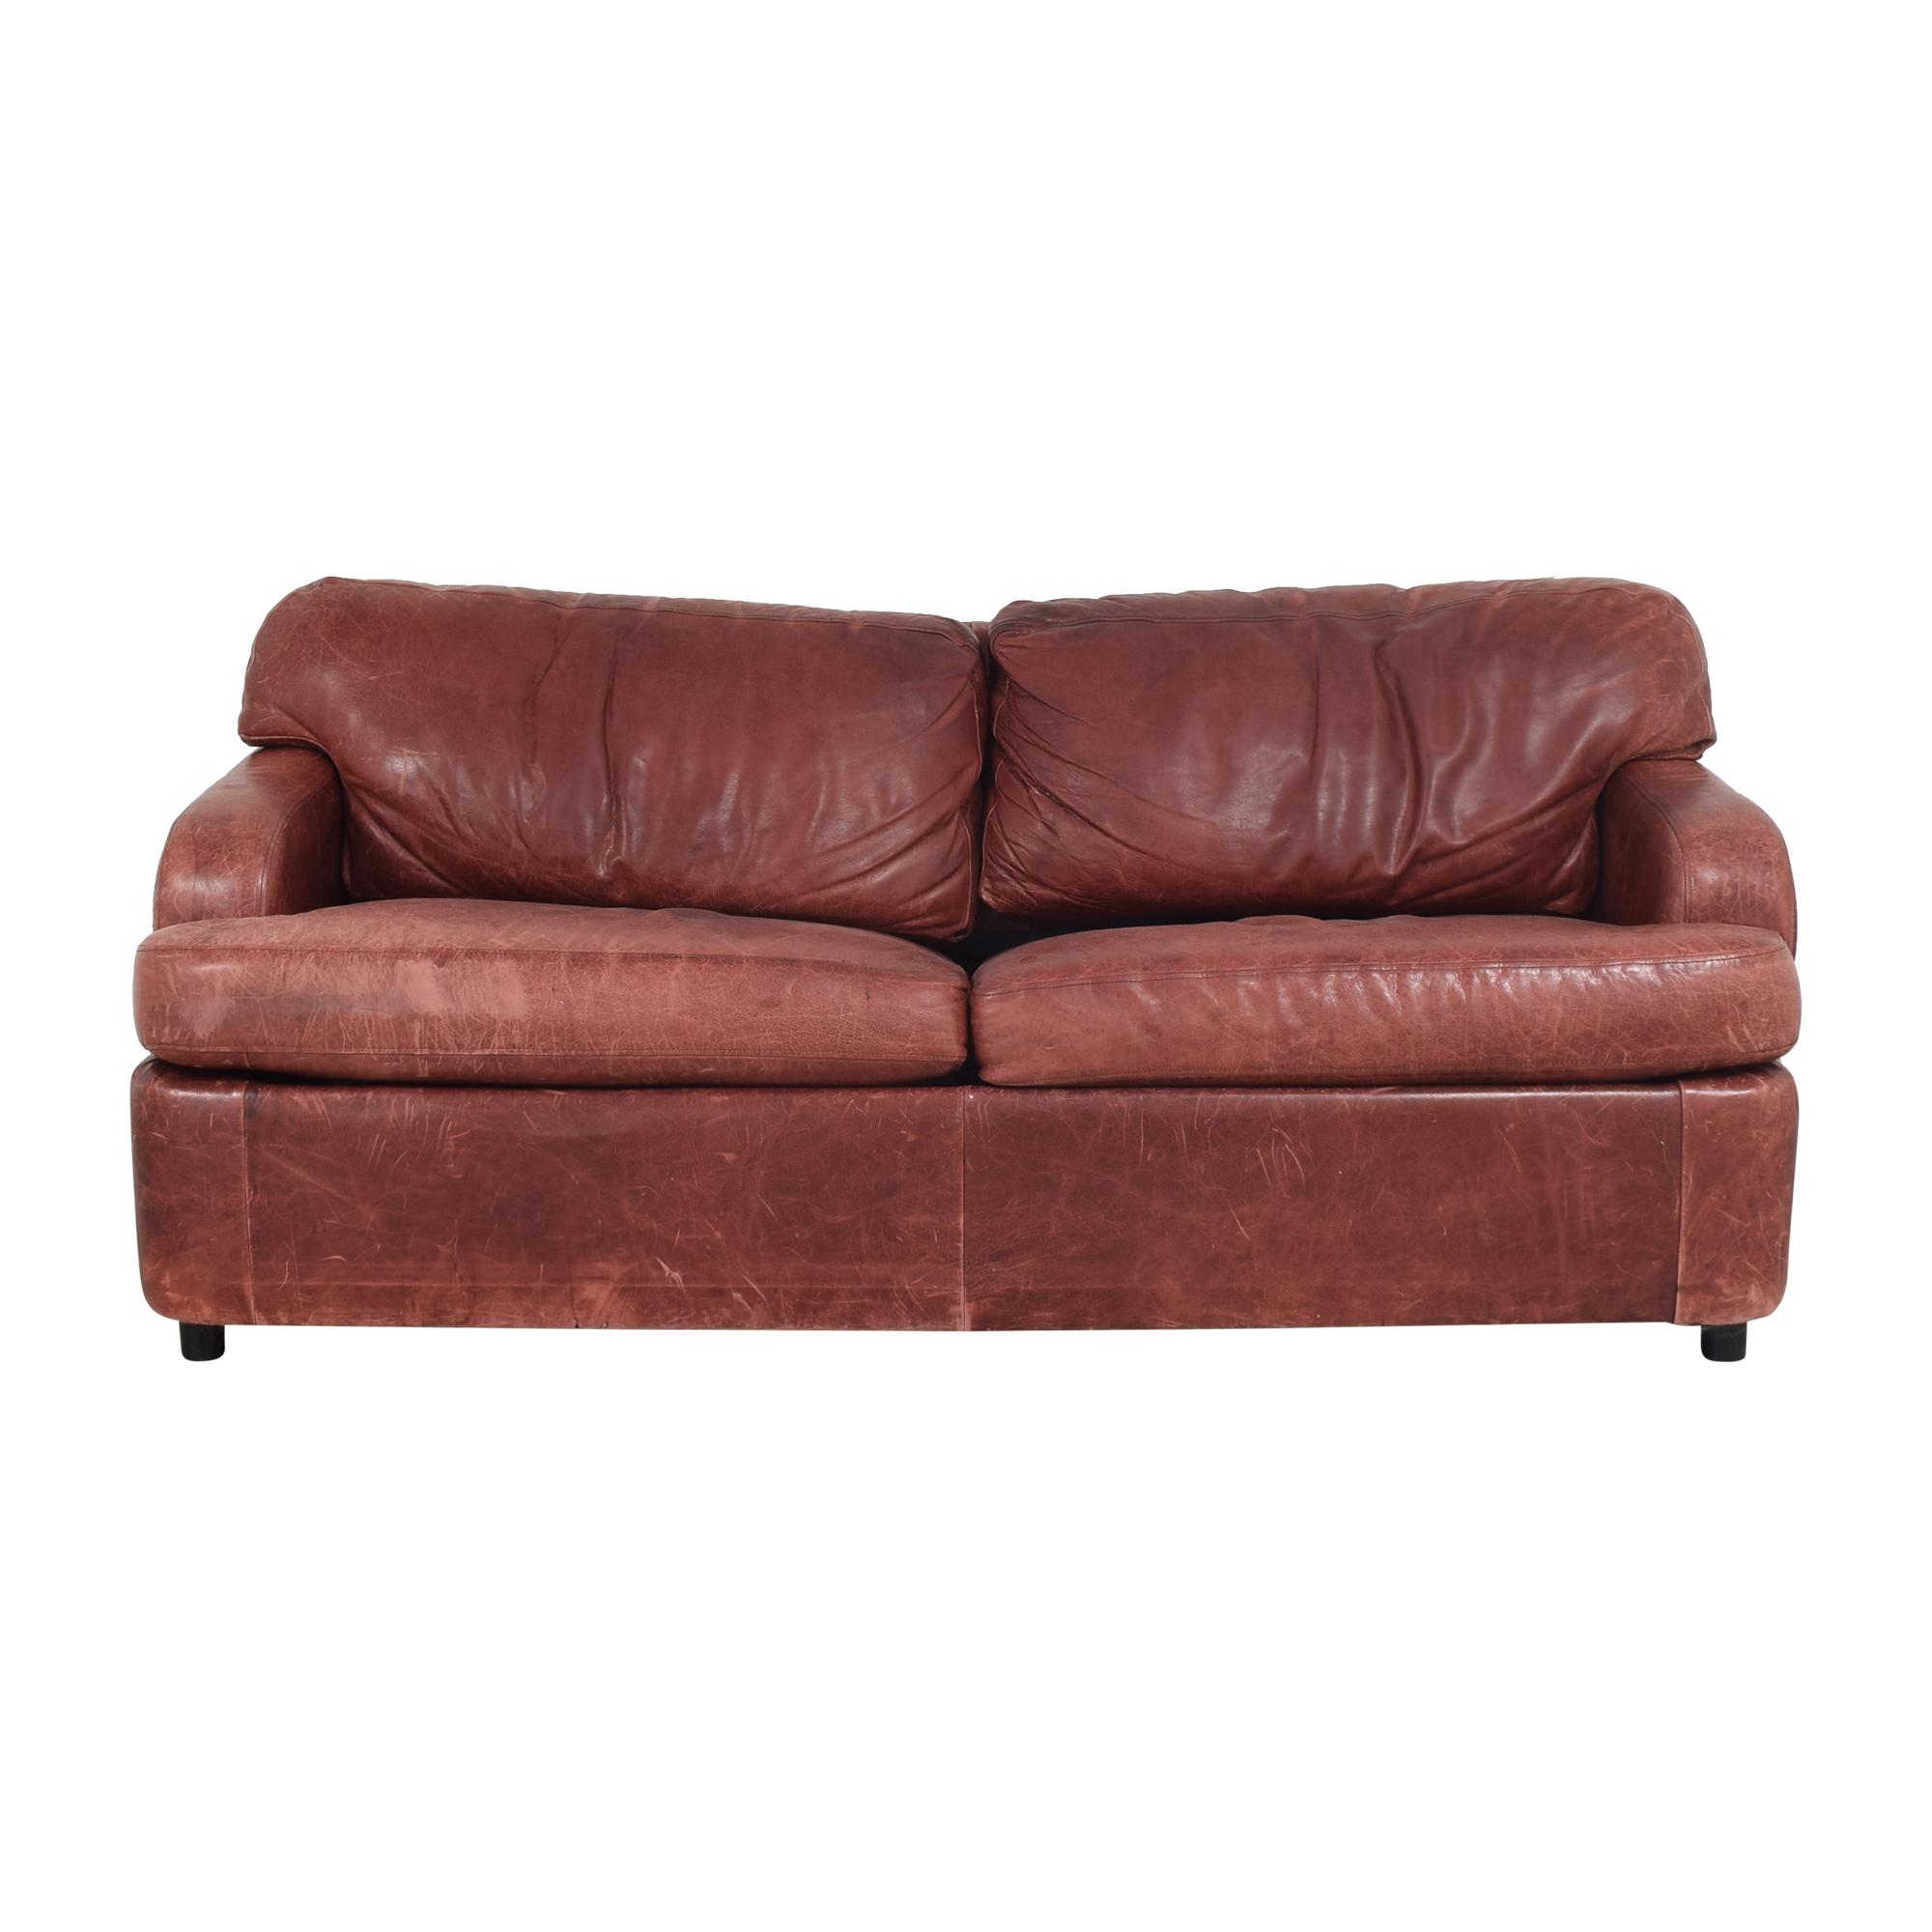 Leather Sleeper Sofa ma